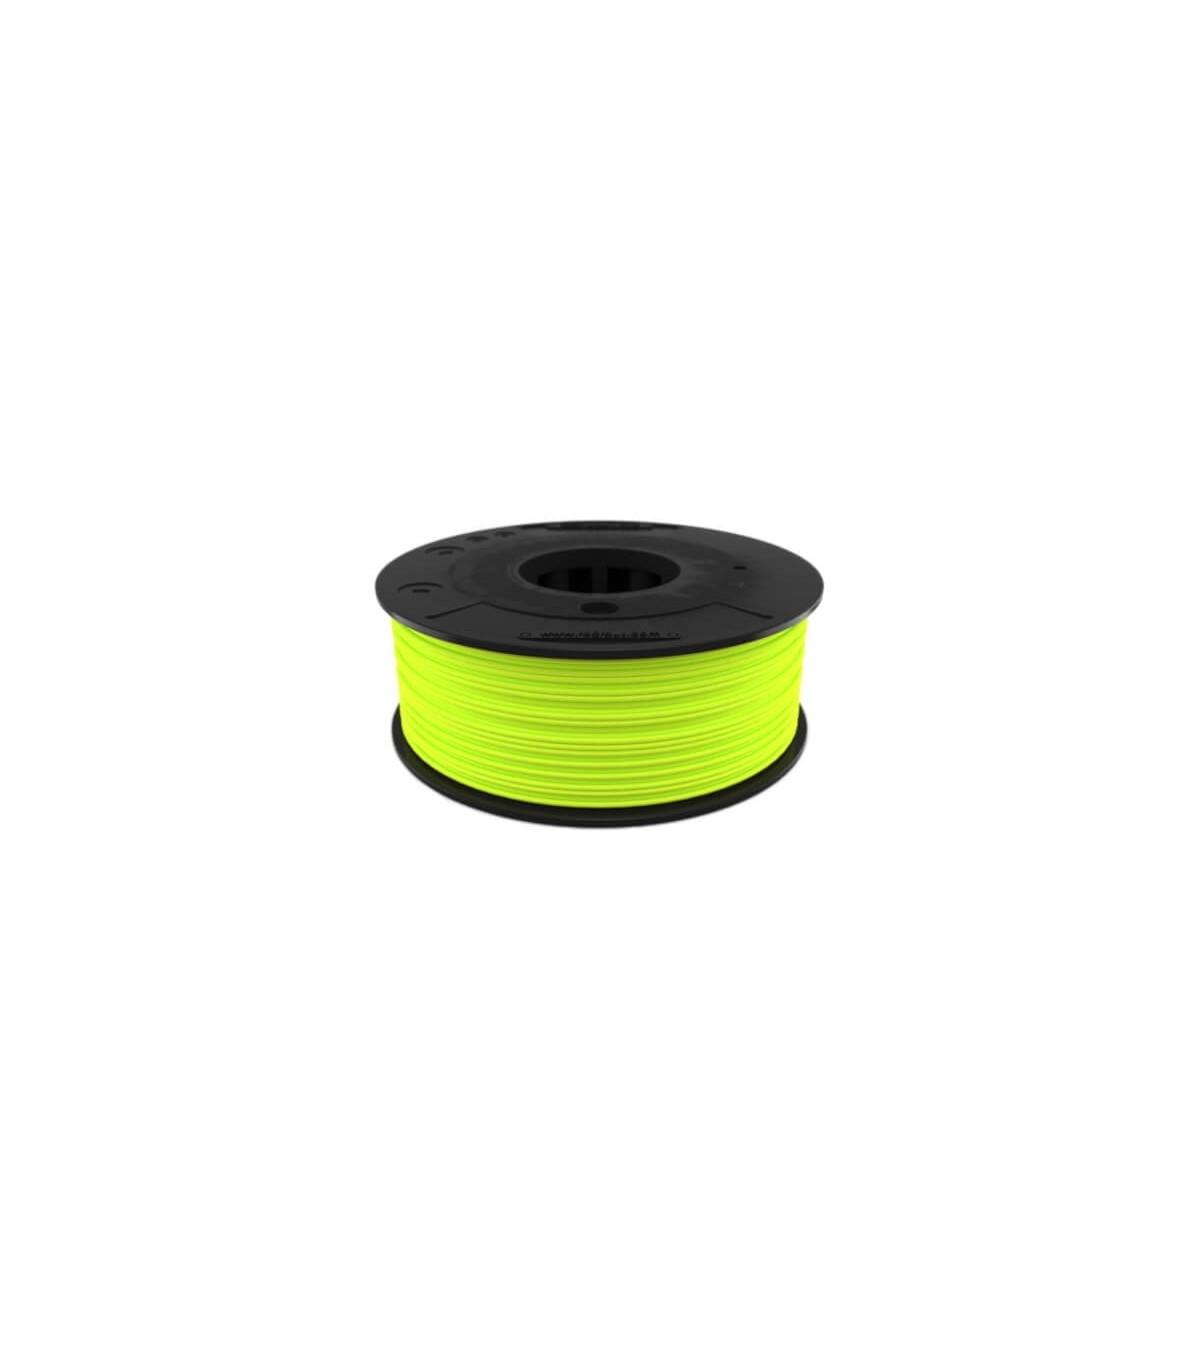 3d Printer Consumables Symbol Of The Brand Smartfil Pla Color Neo Yellow